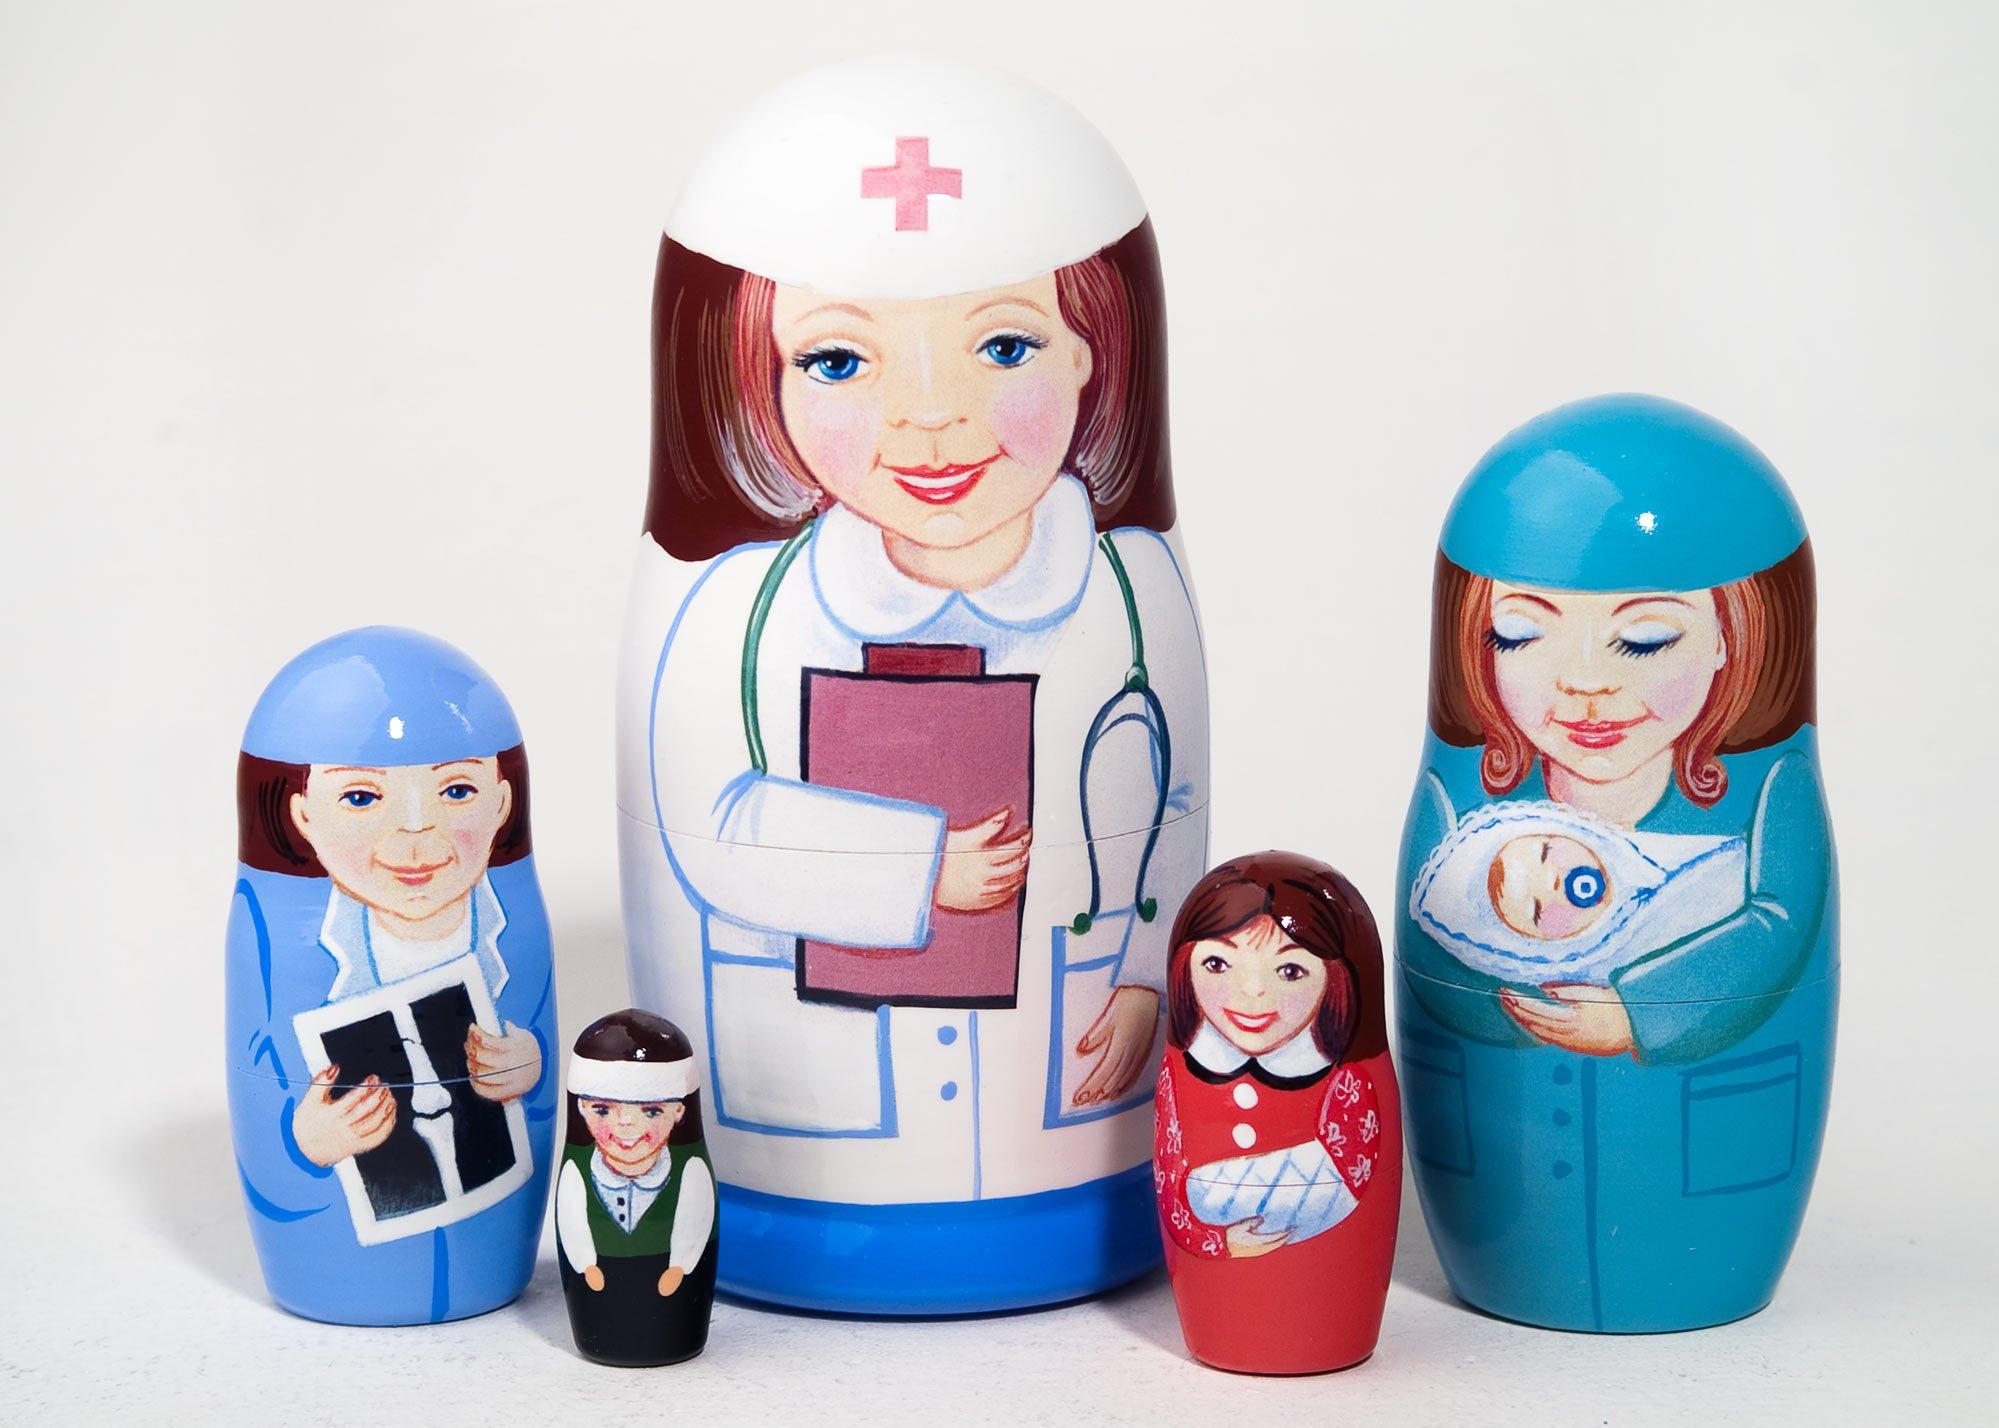 Nurse 5-piece Russian Wood Nesting Doll by Golden Cockerel